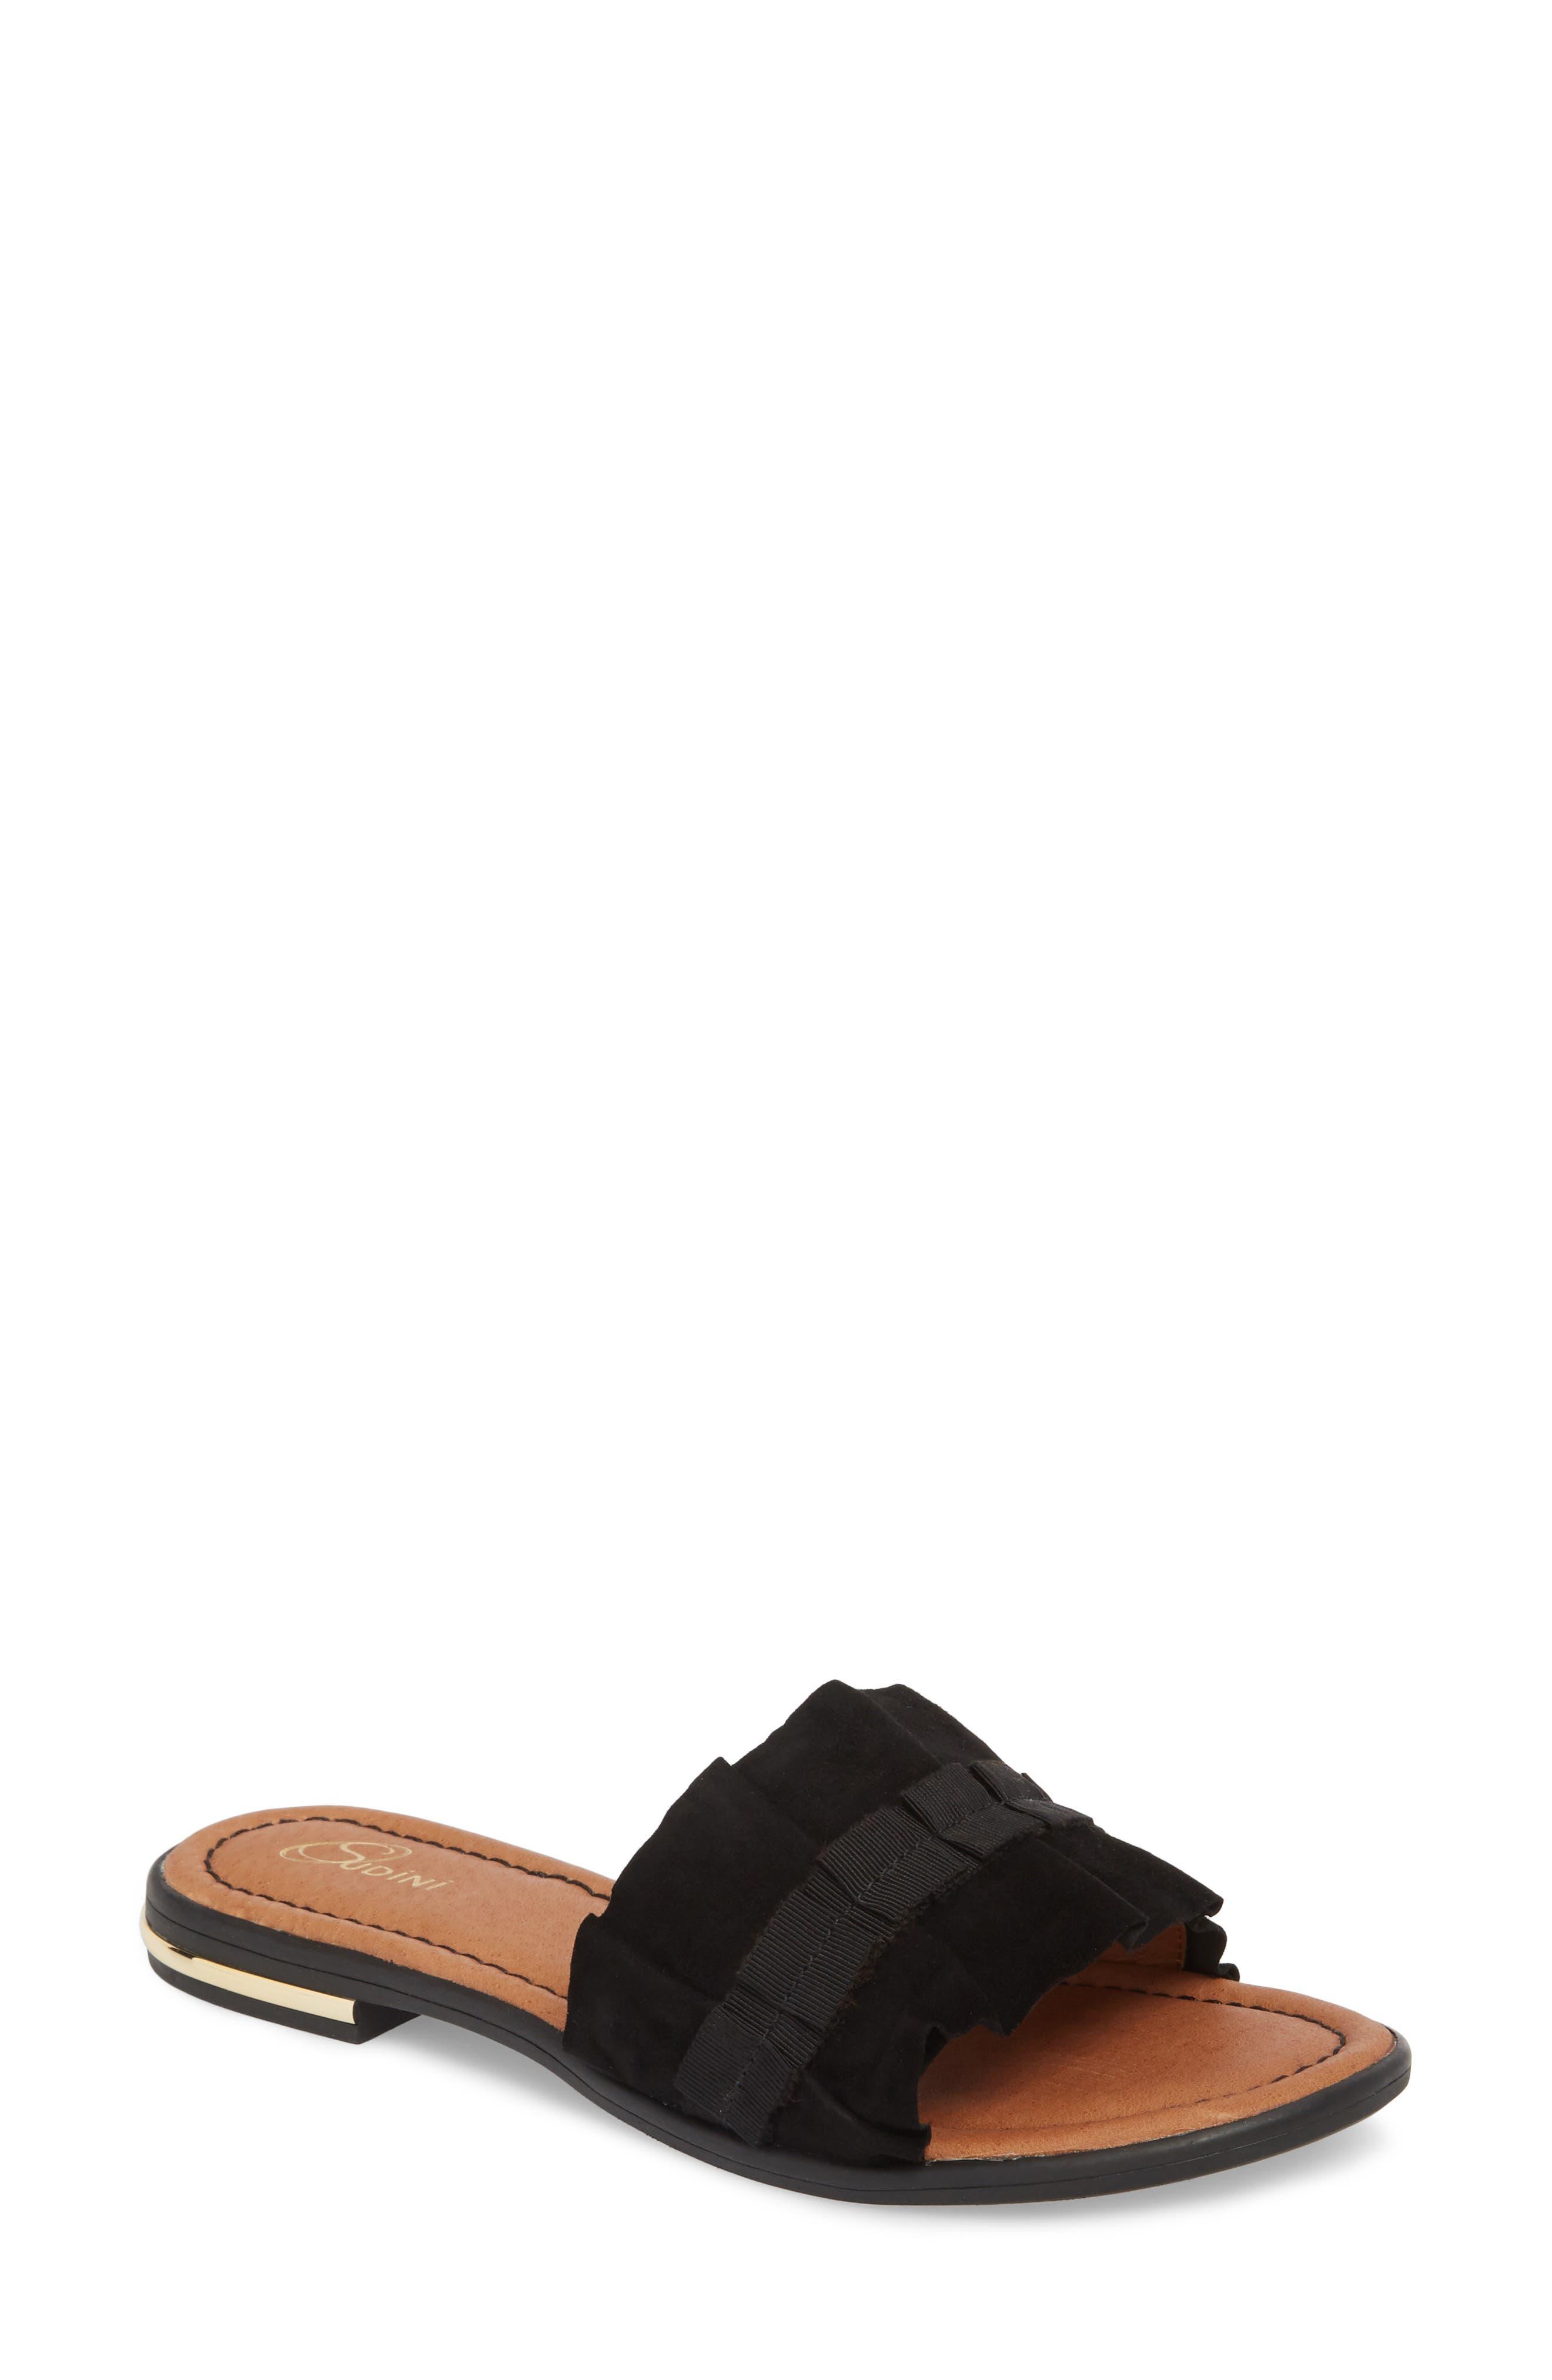 Sudini Ravenna Slide Sandal- Black